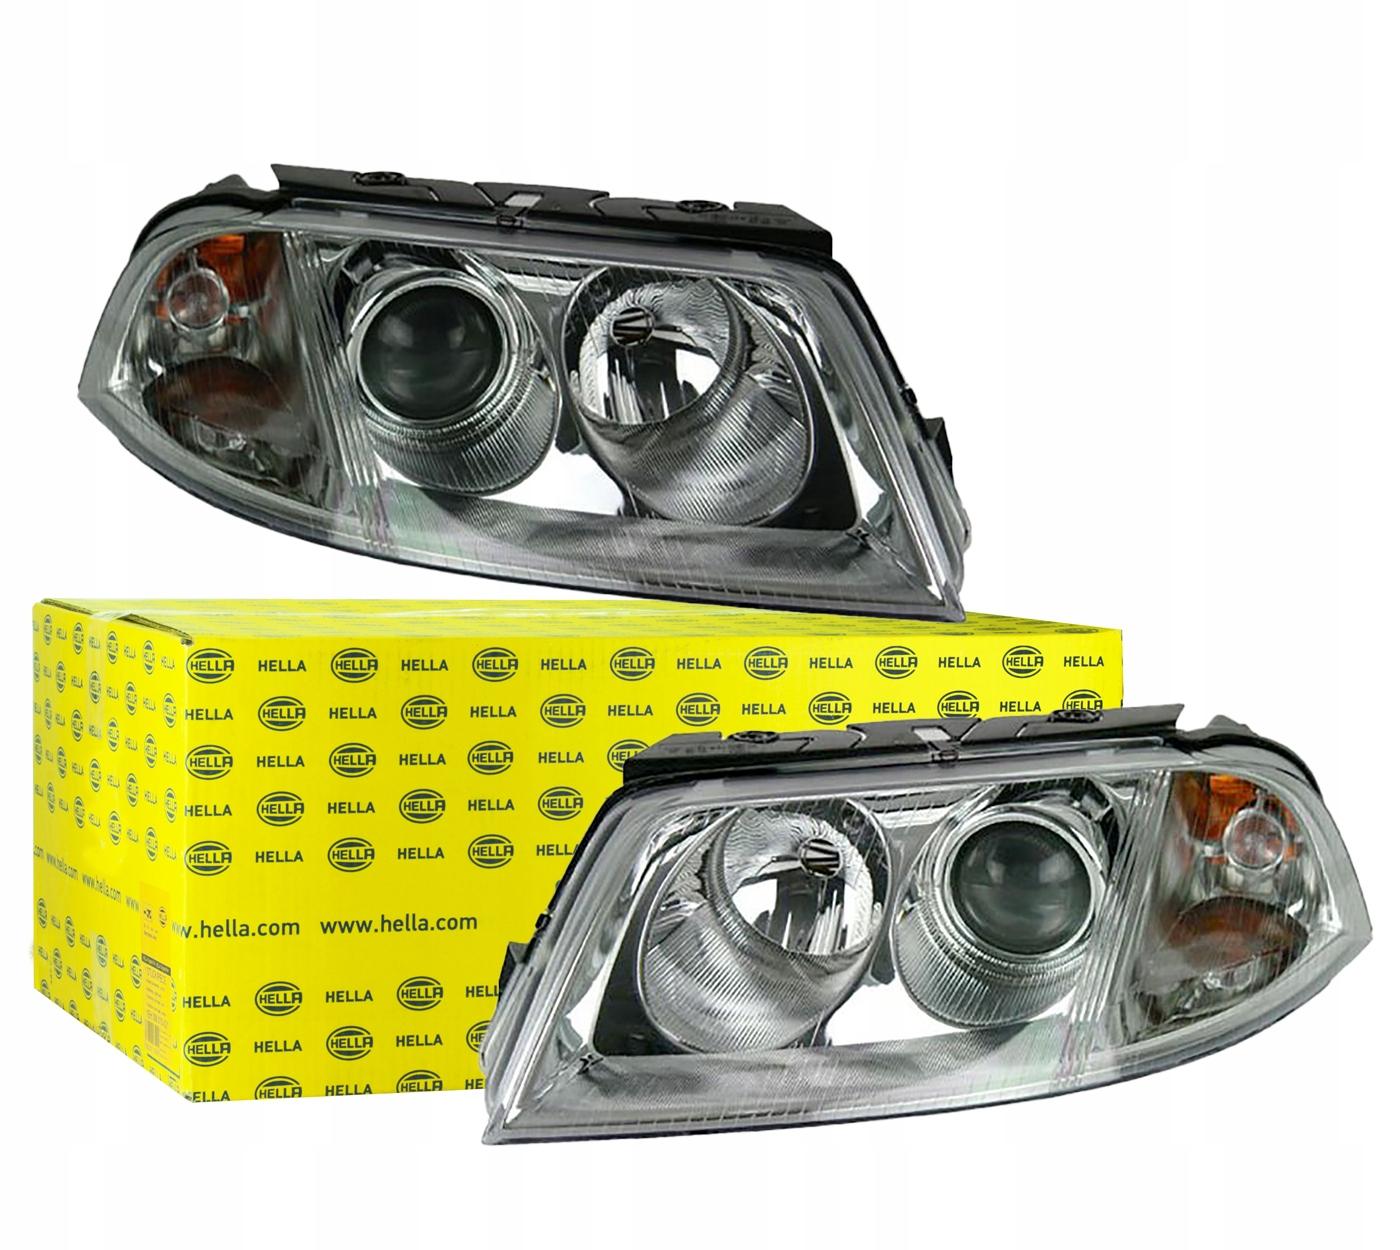 лампы фары vw passat v b5 fl 00-05 комплект